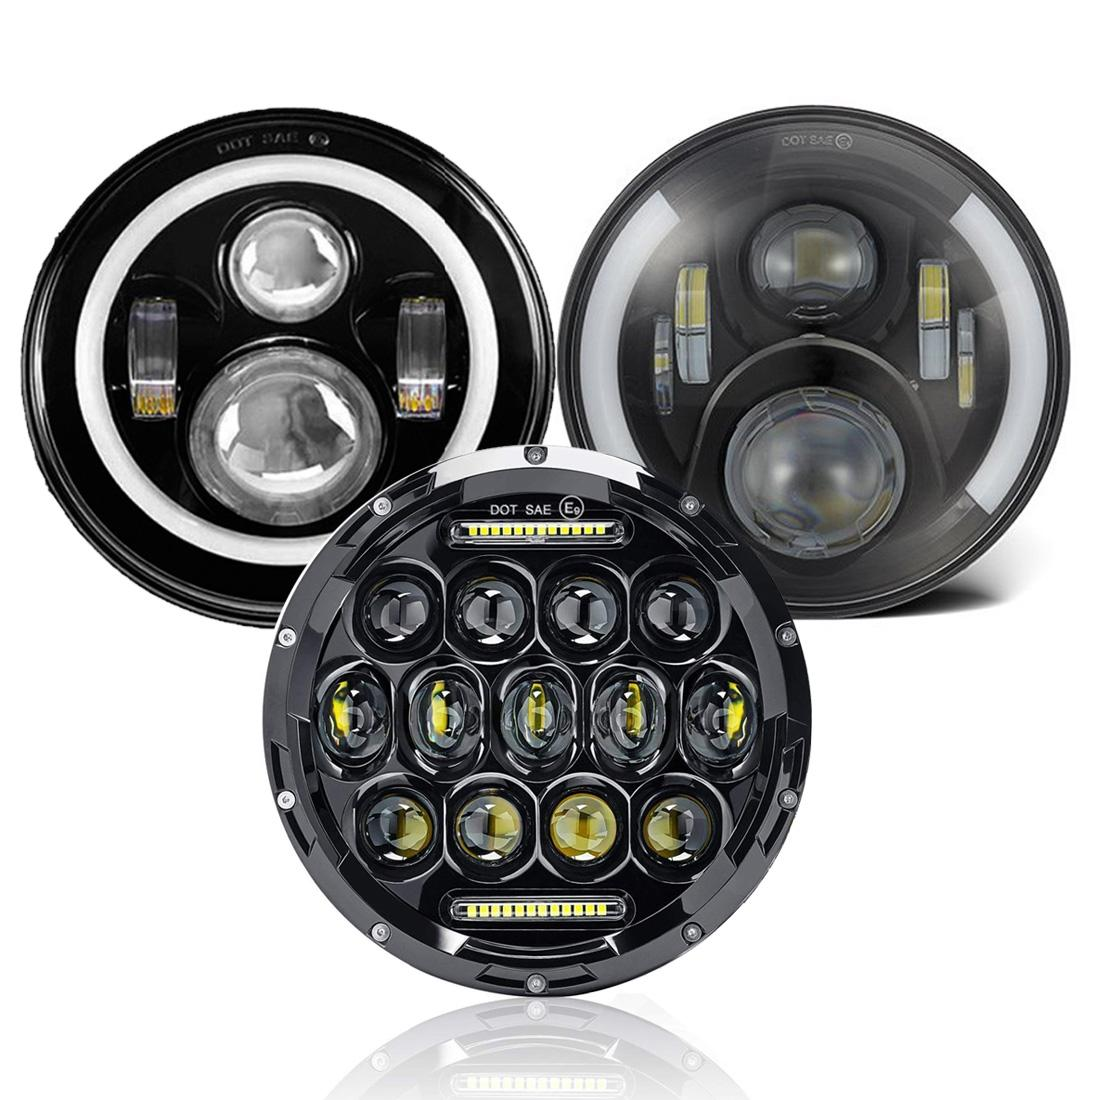 7Inch Led Headlight High Low Beam Halo Ring DRL Headlamp For Jeep Wrangler JK TJ Land Rover For Harley Davidson Lada Niva 4x4